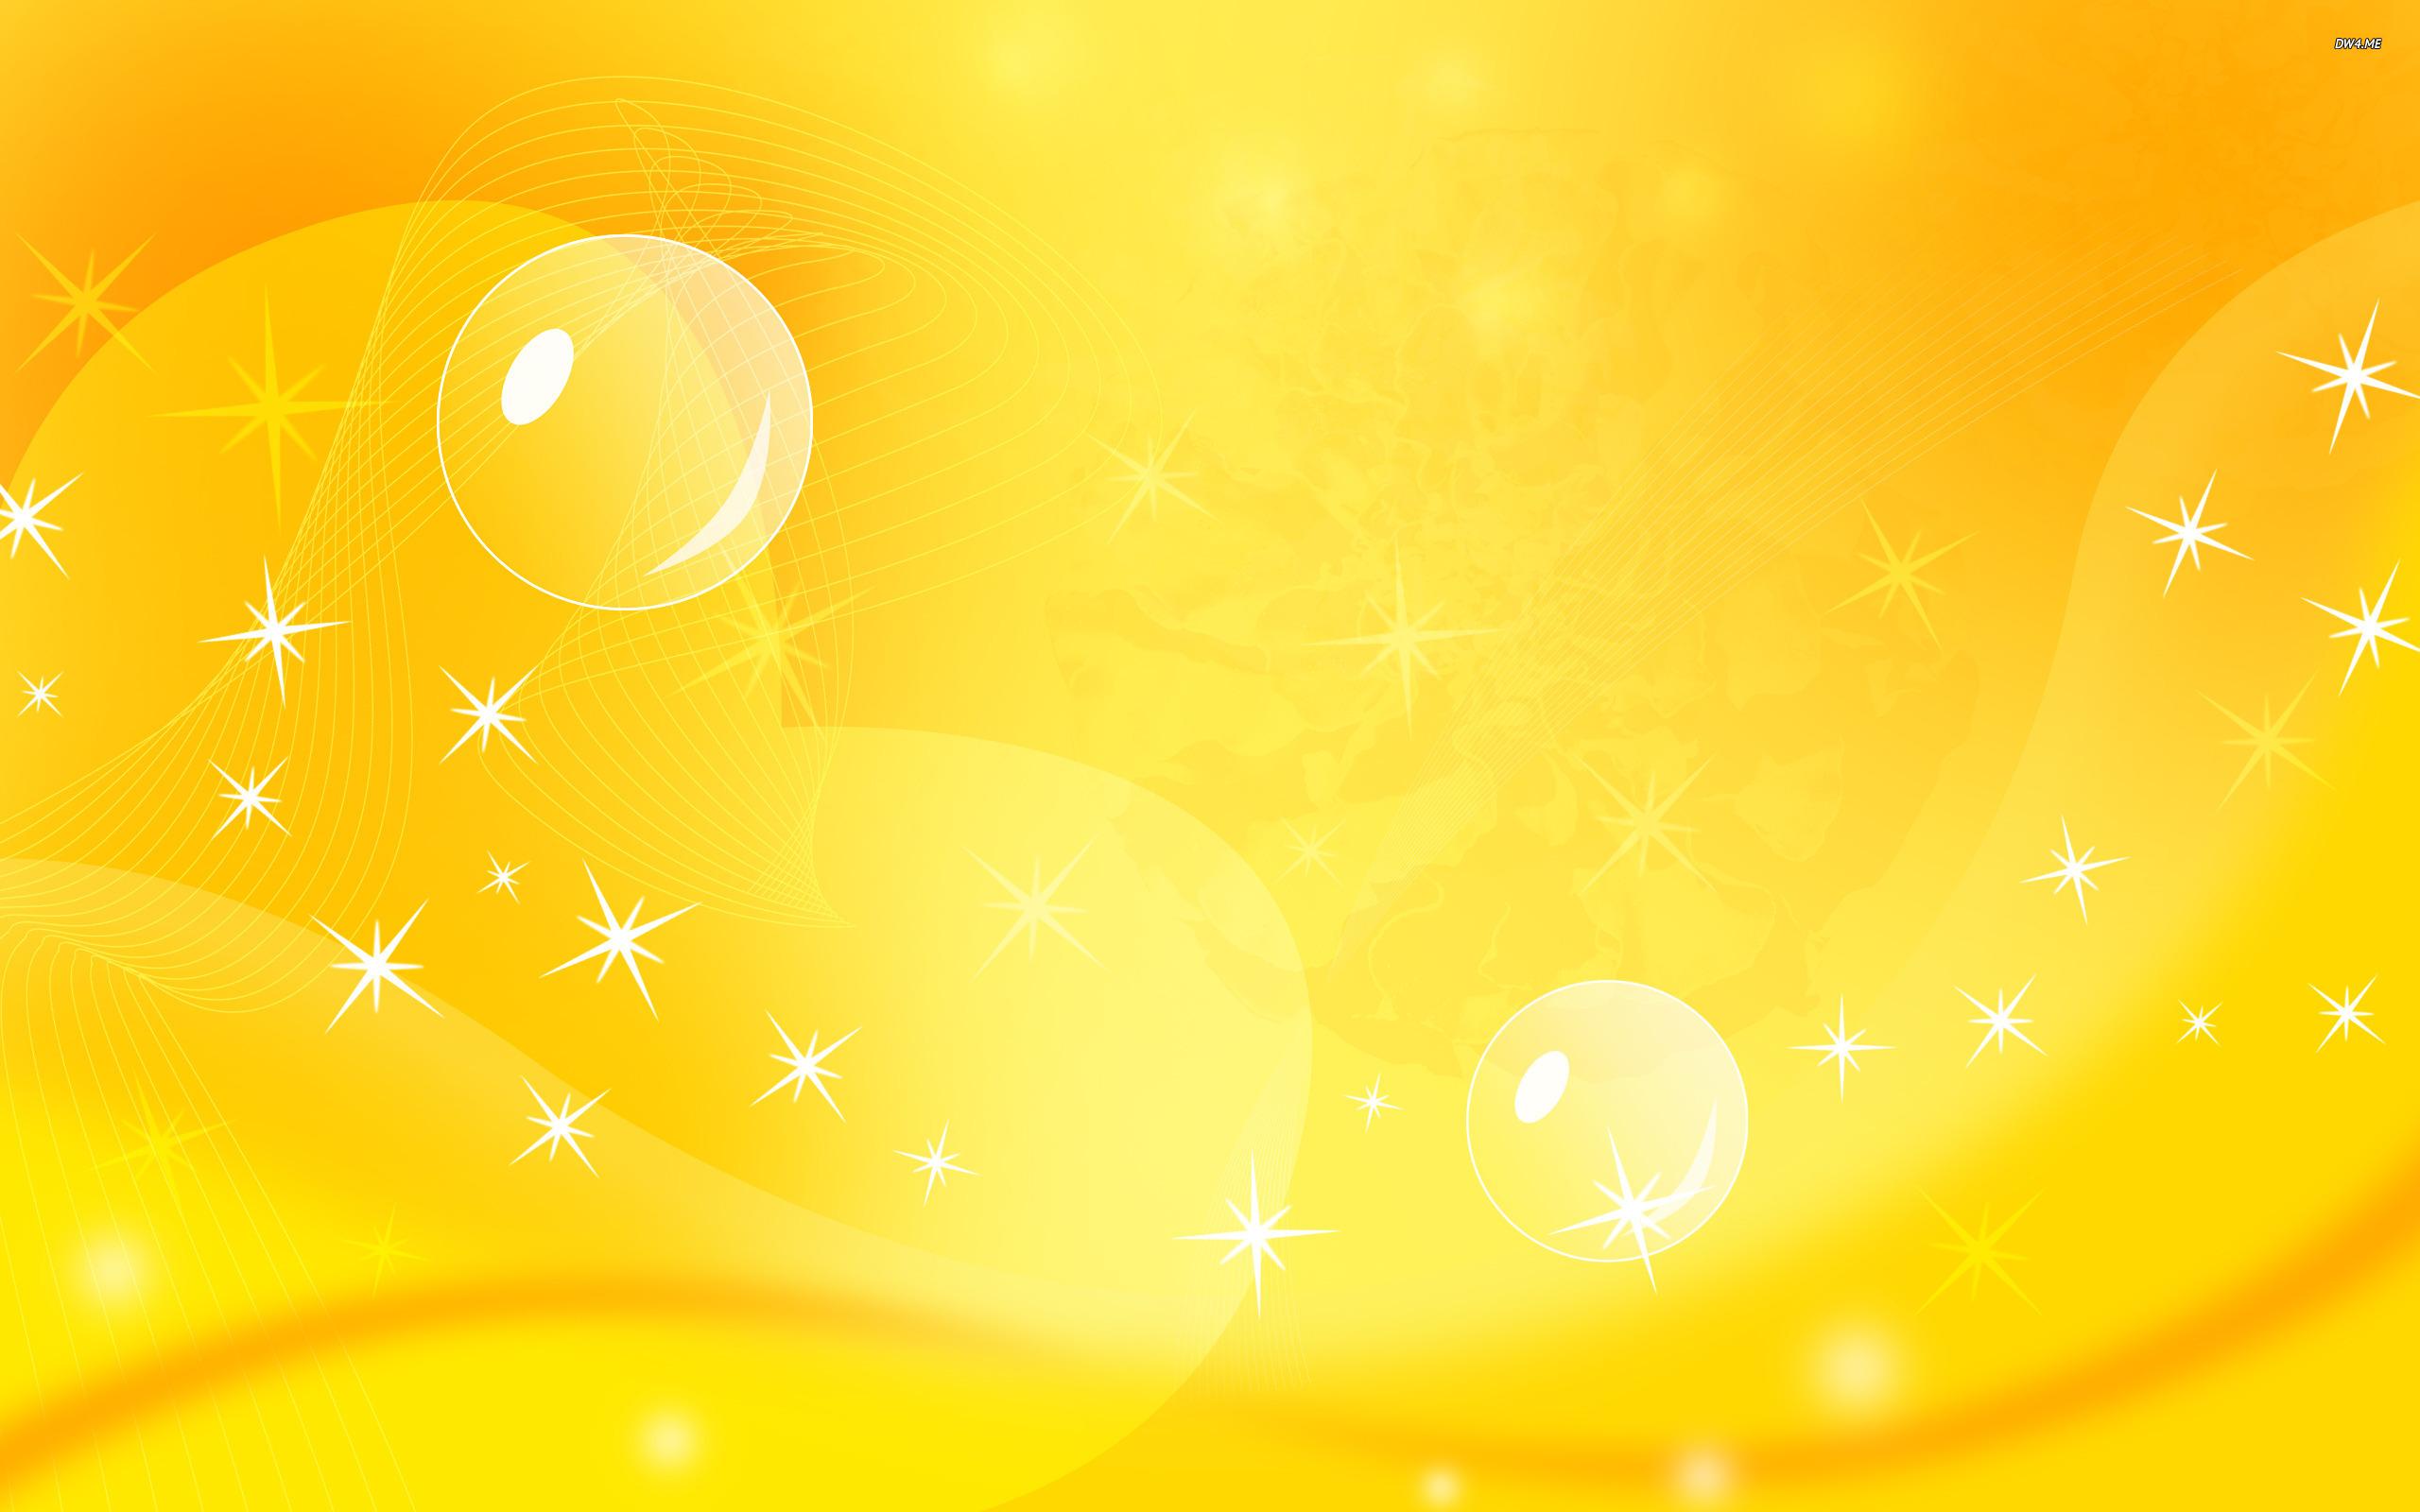 Yellow Background Image - WallpaperSafari